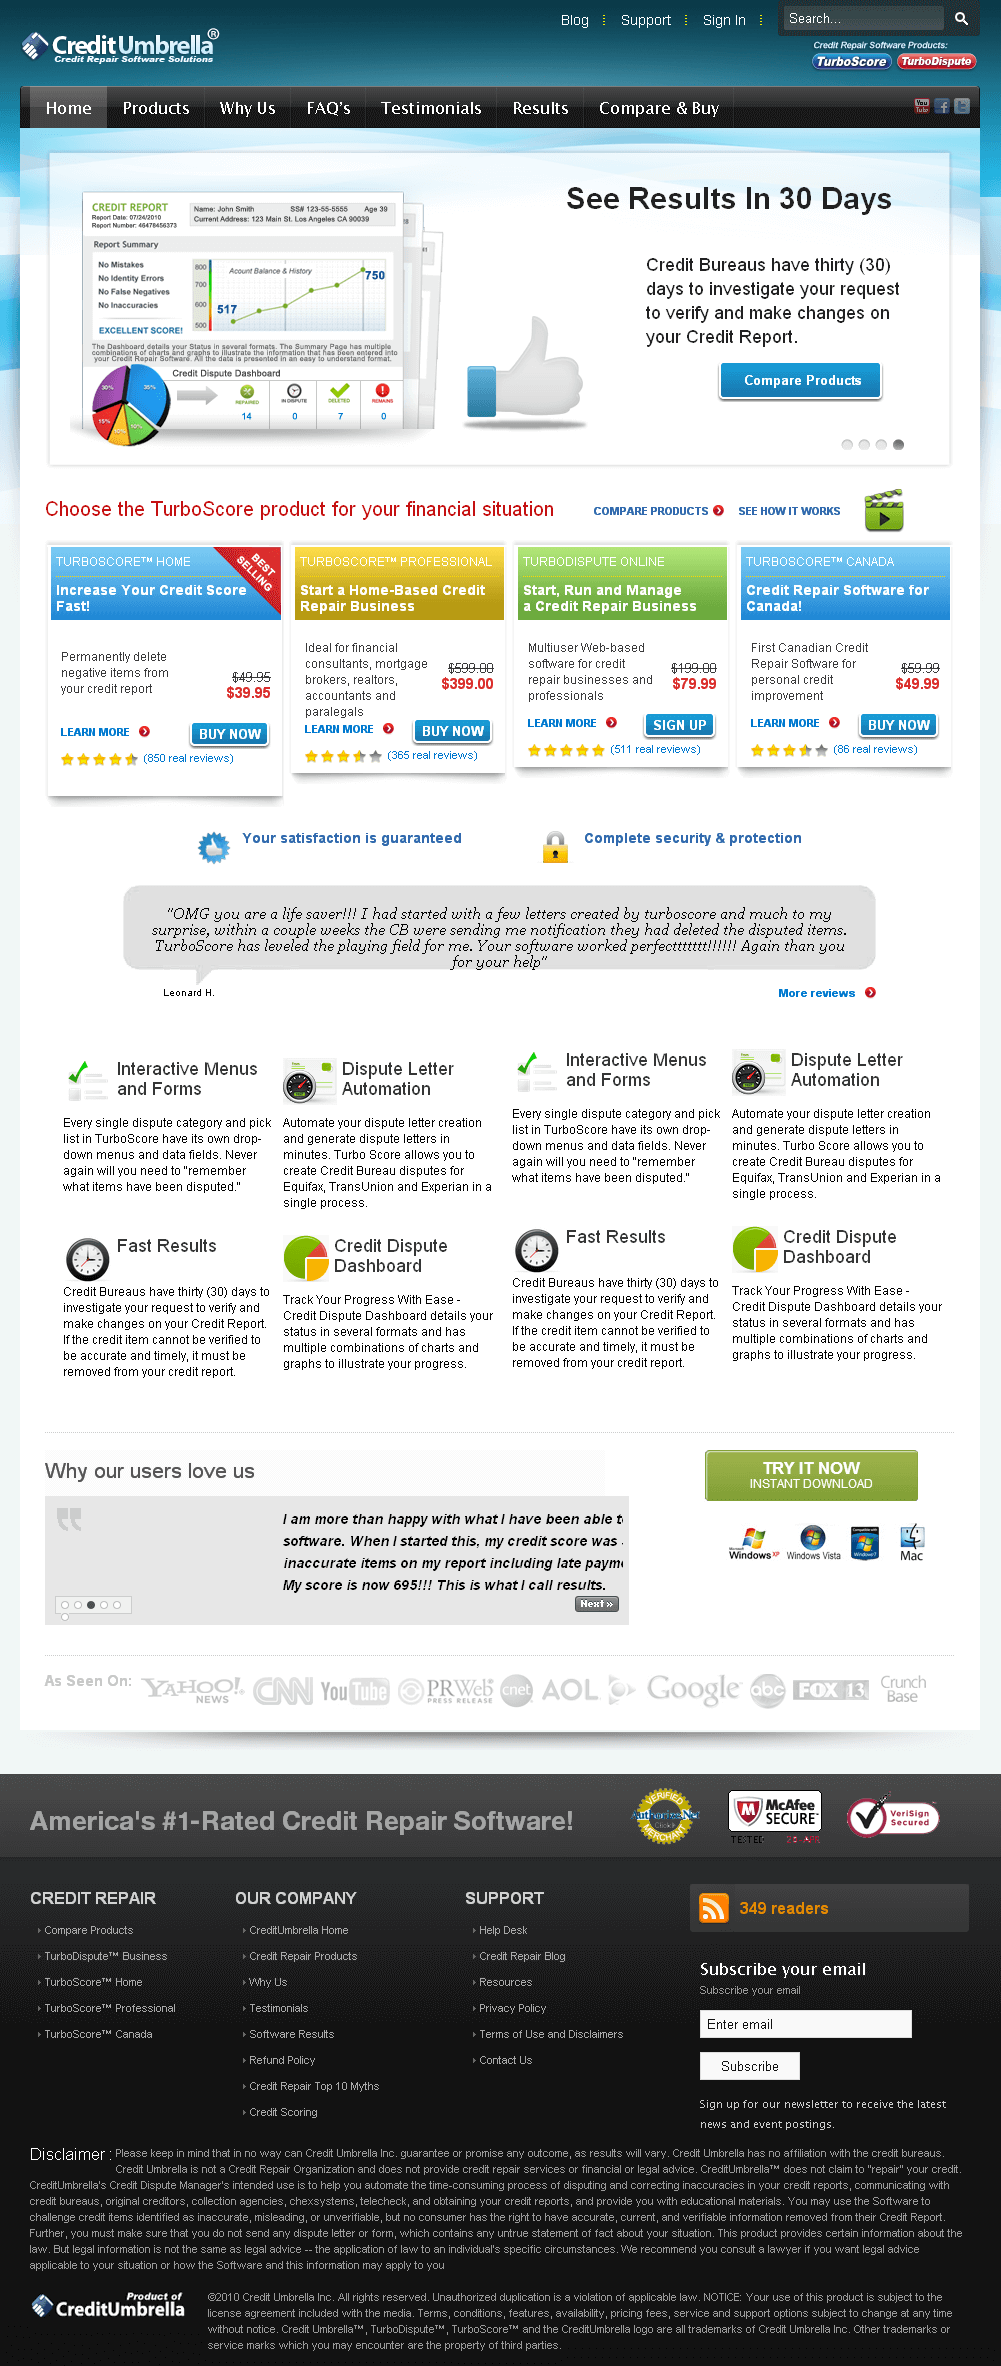 Redevelopment of Wordpress CMS Based  Website - Creditumbrella.com